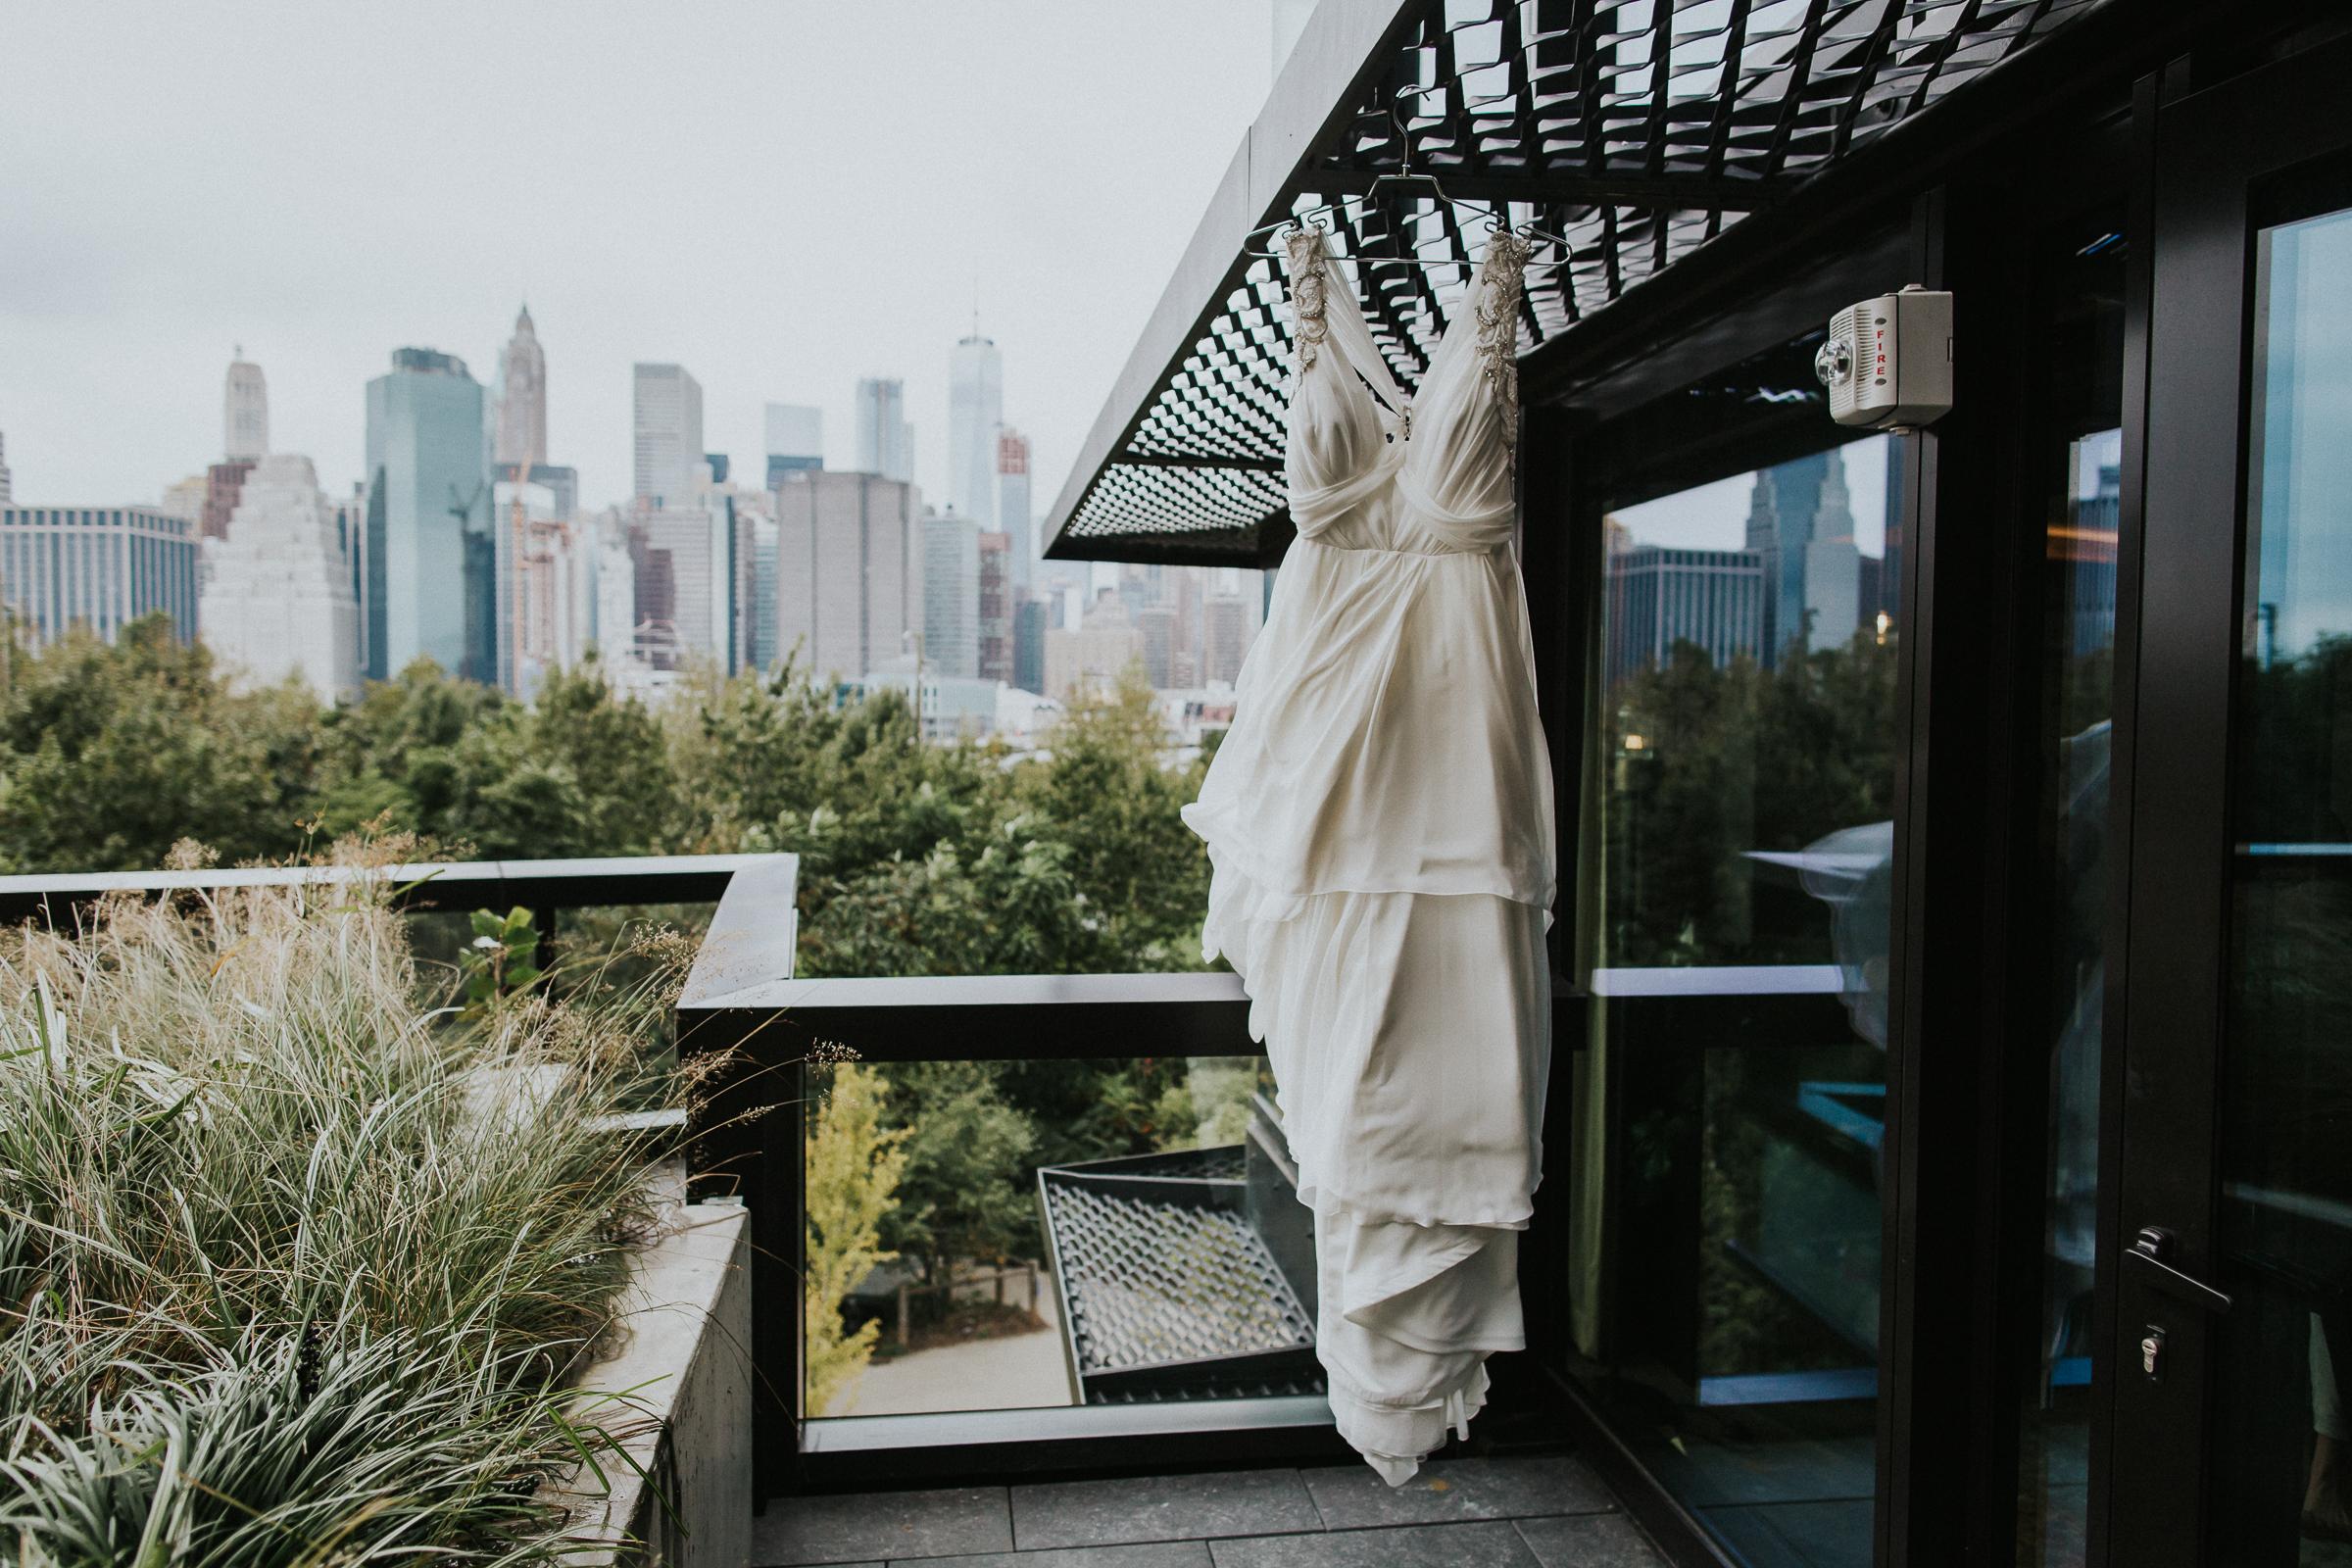 NYC-Brooklyn-Hotel-1-Botanic-Garden-Documentary-Wedding-Photographer-3.jpg